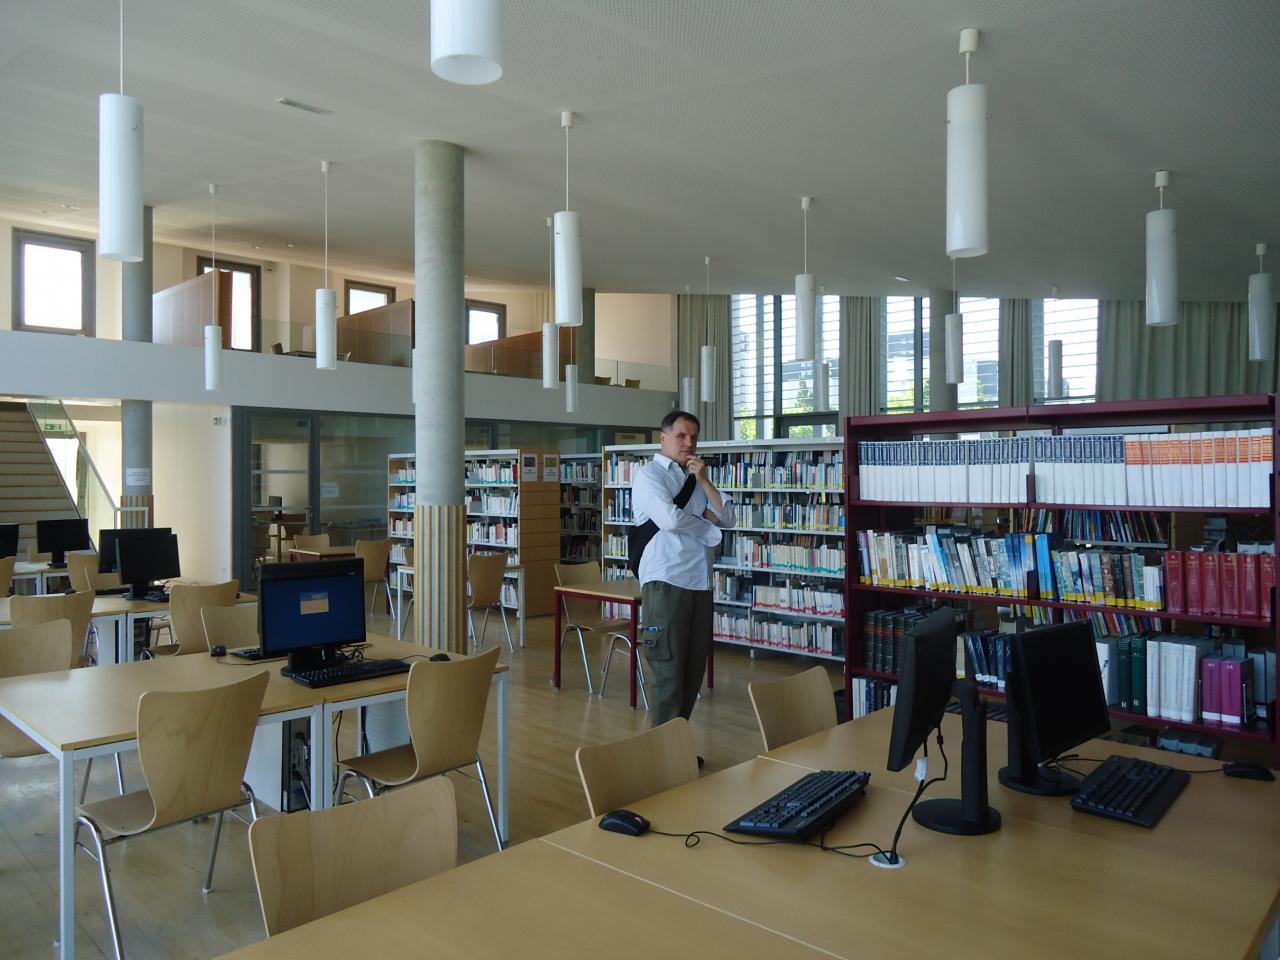 Salle de documentation.